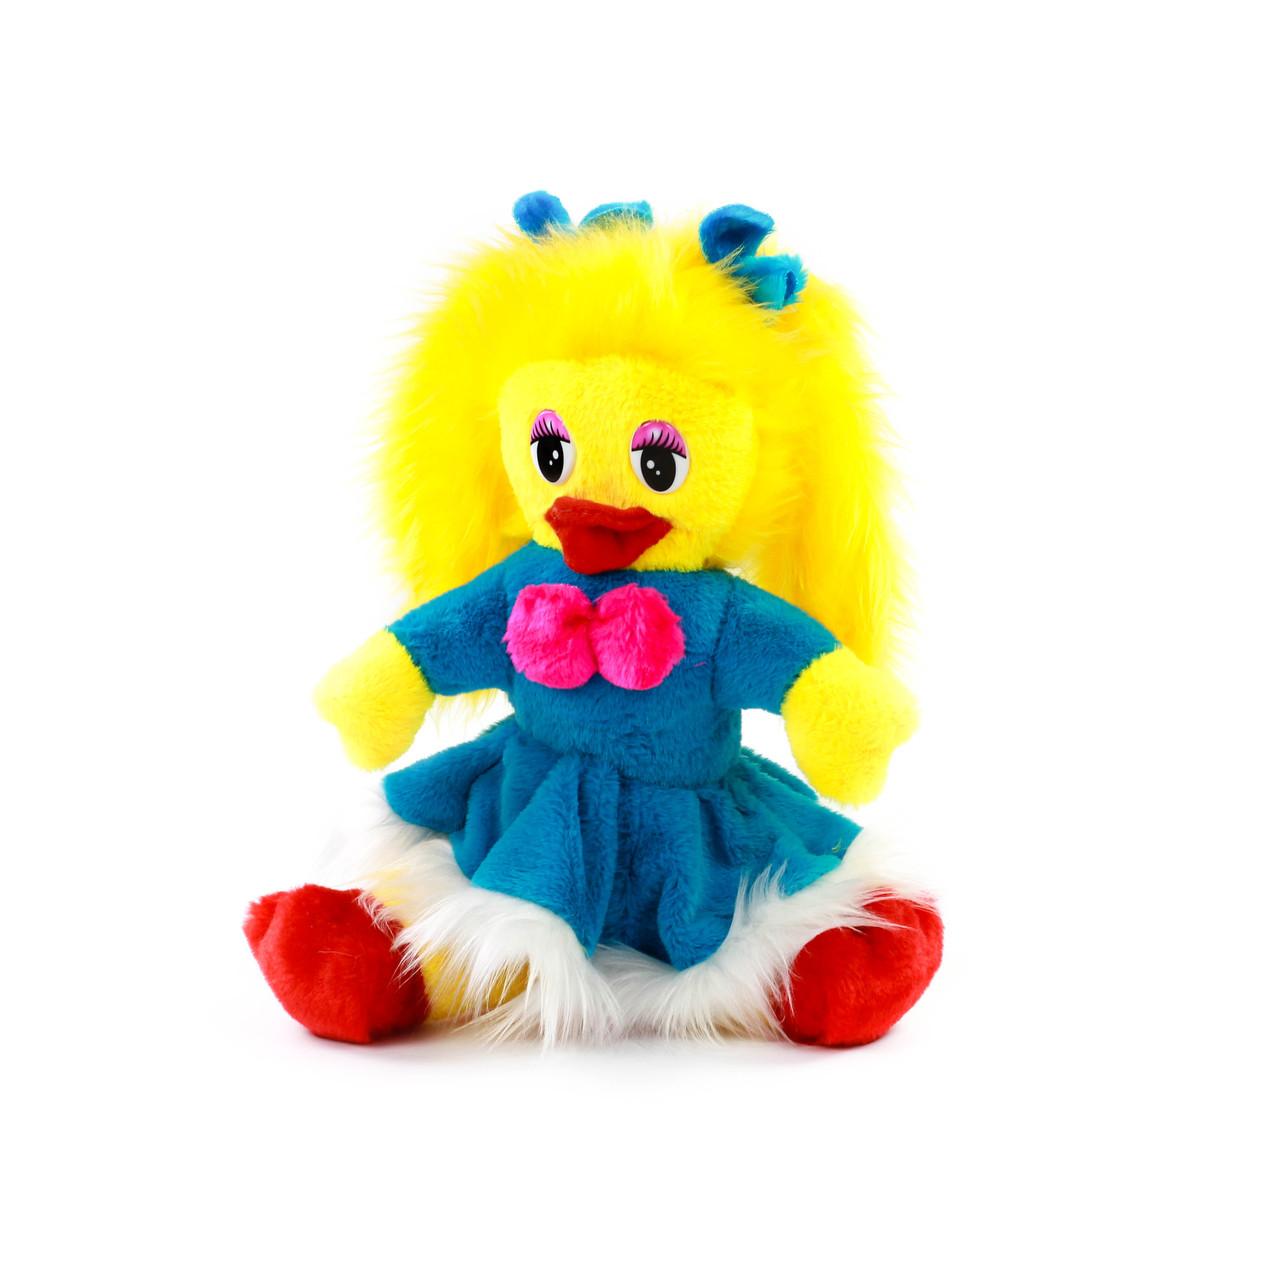 М'яка іграшка Качка Понка